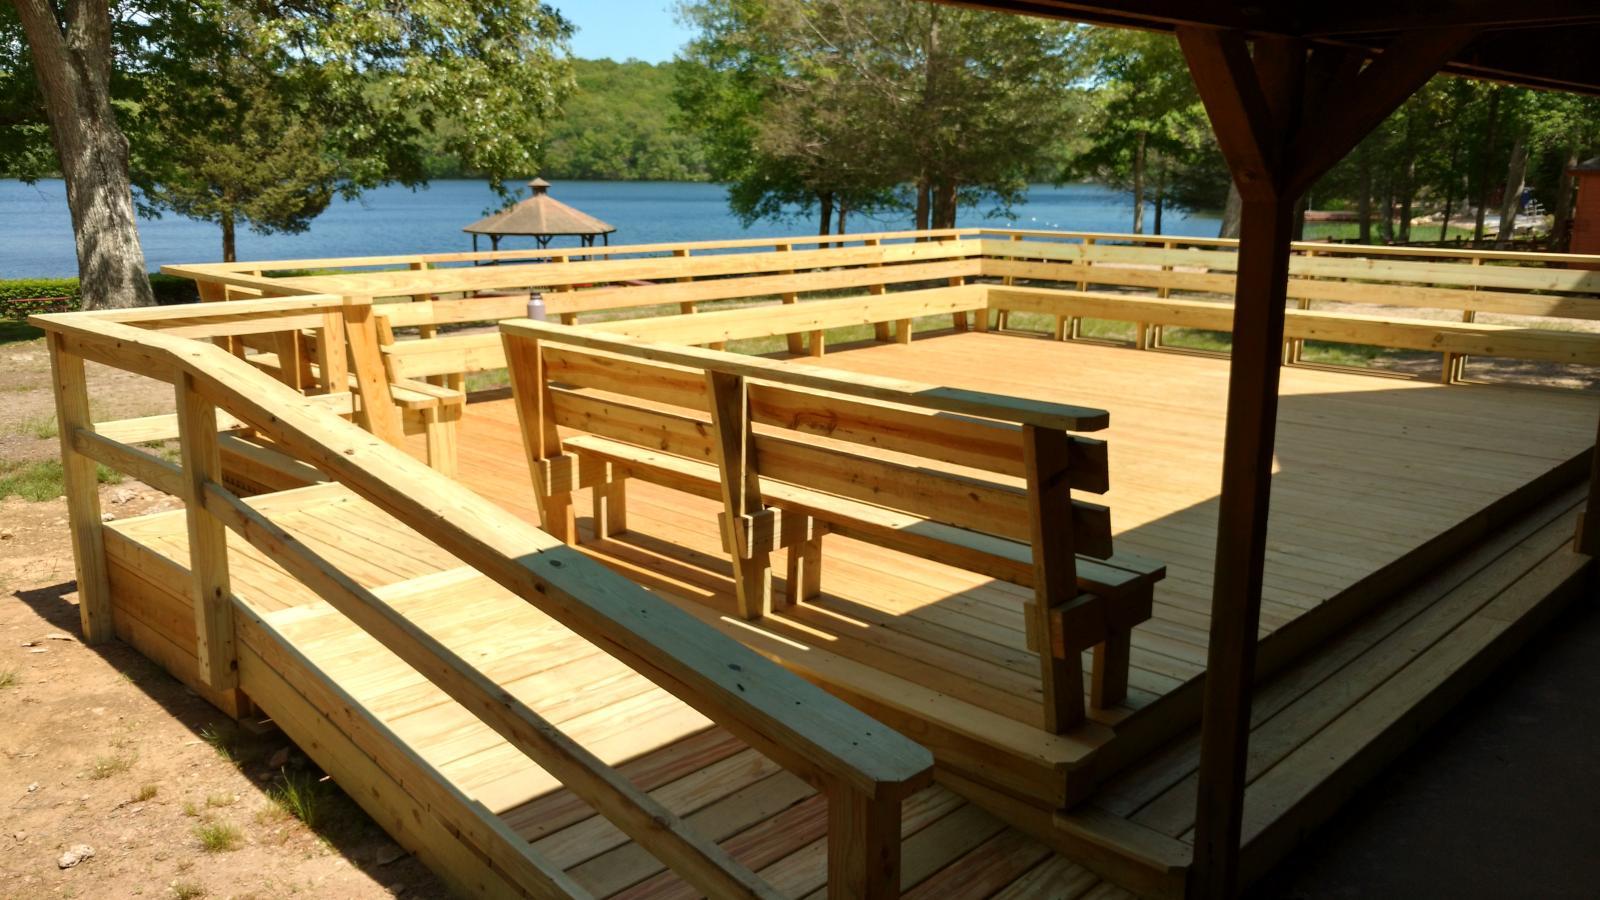 New deck on Pavilion June 2017